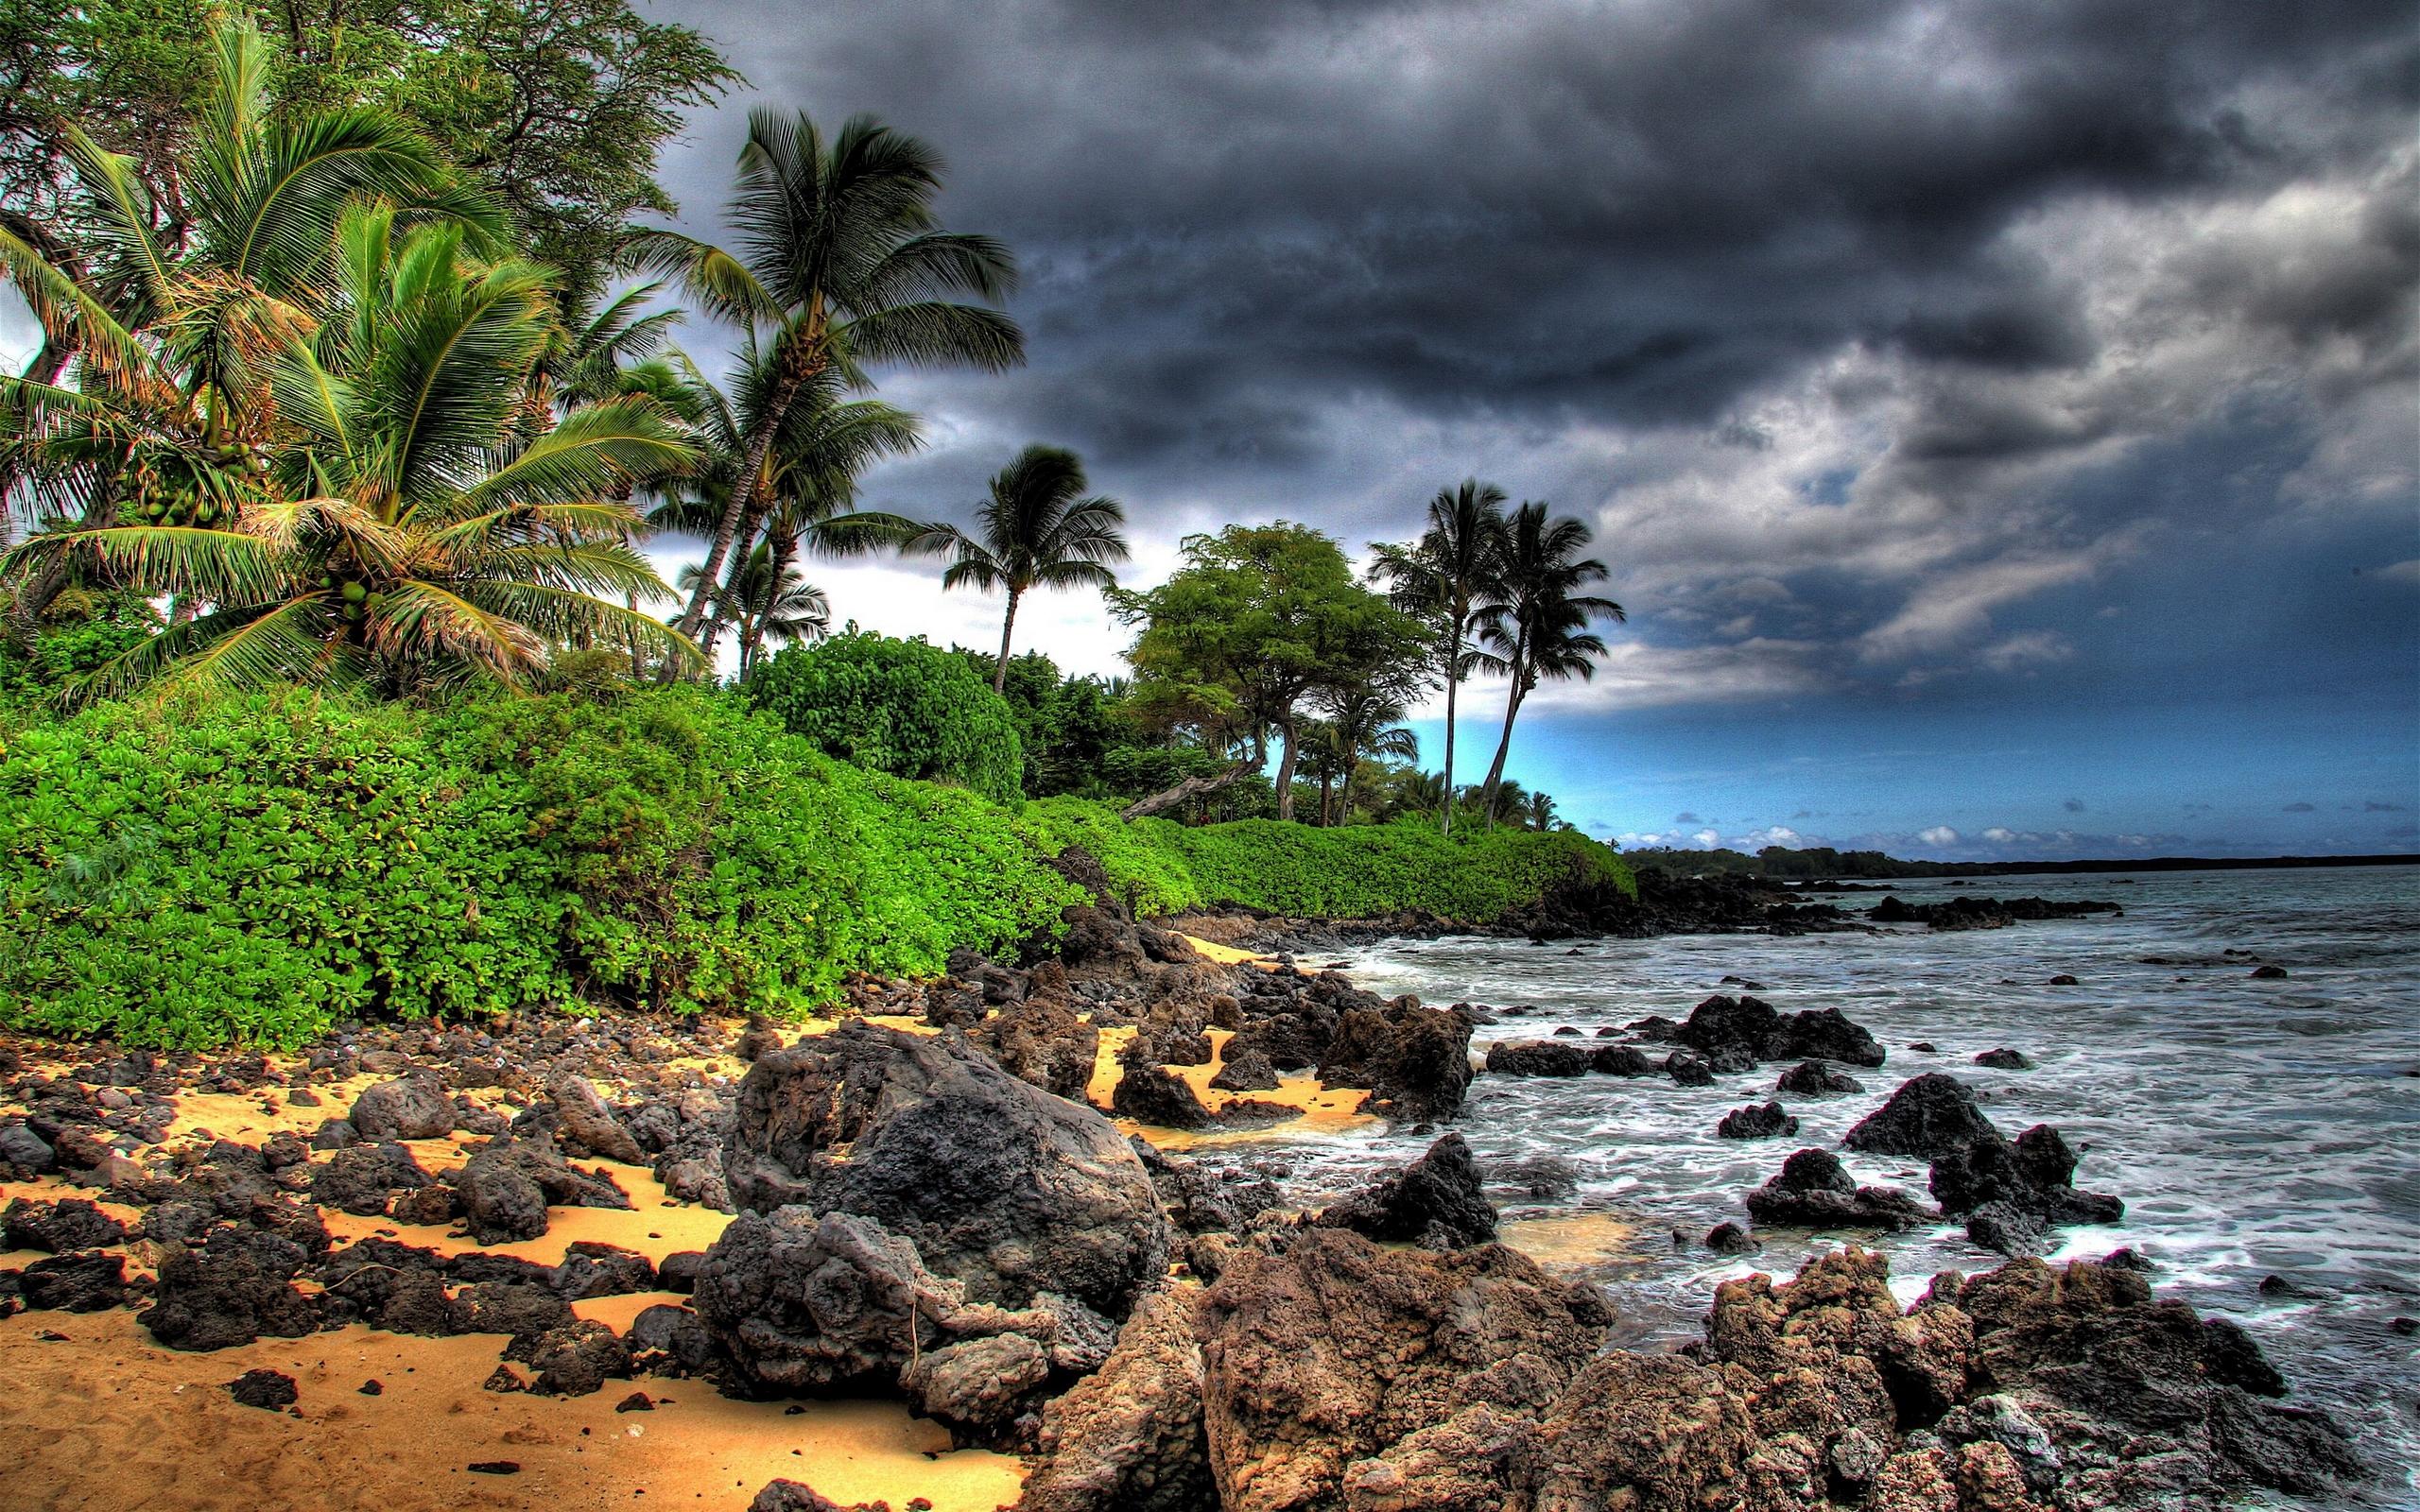 море остров небо камни  № 1034197 бесплатно